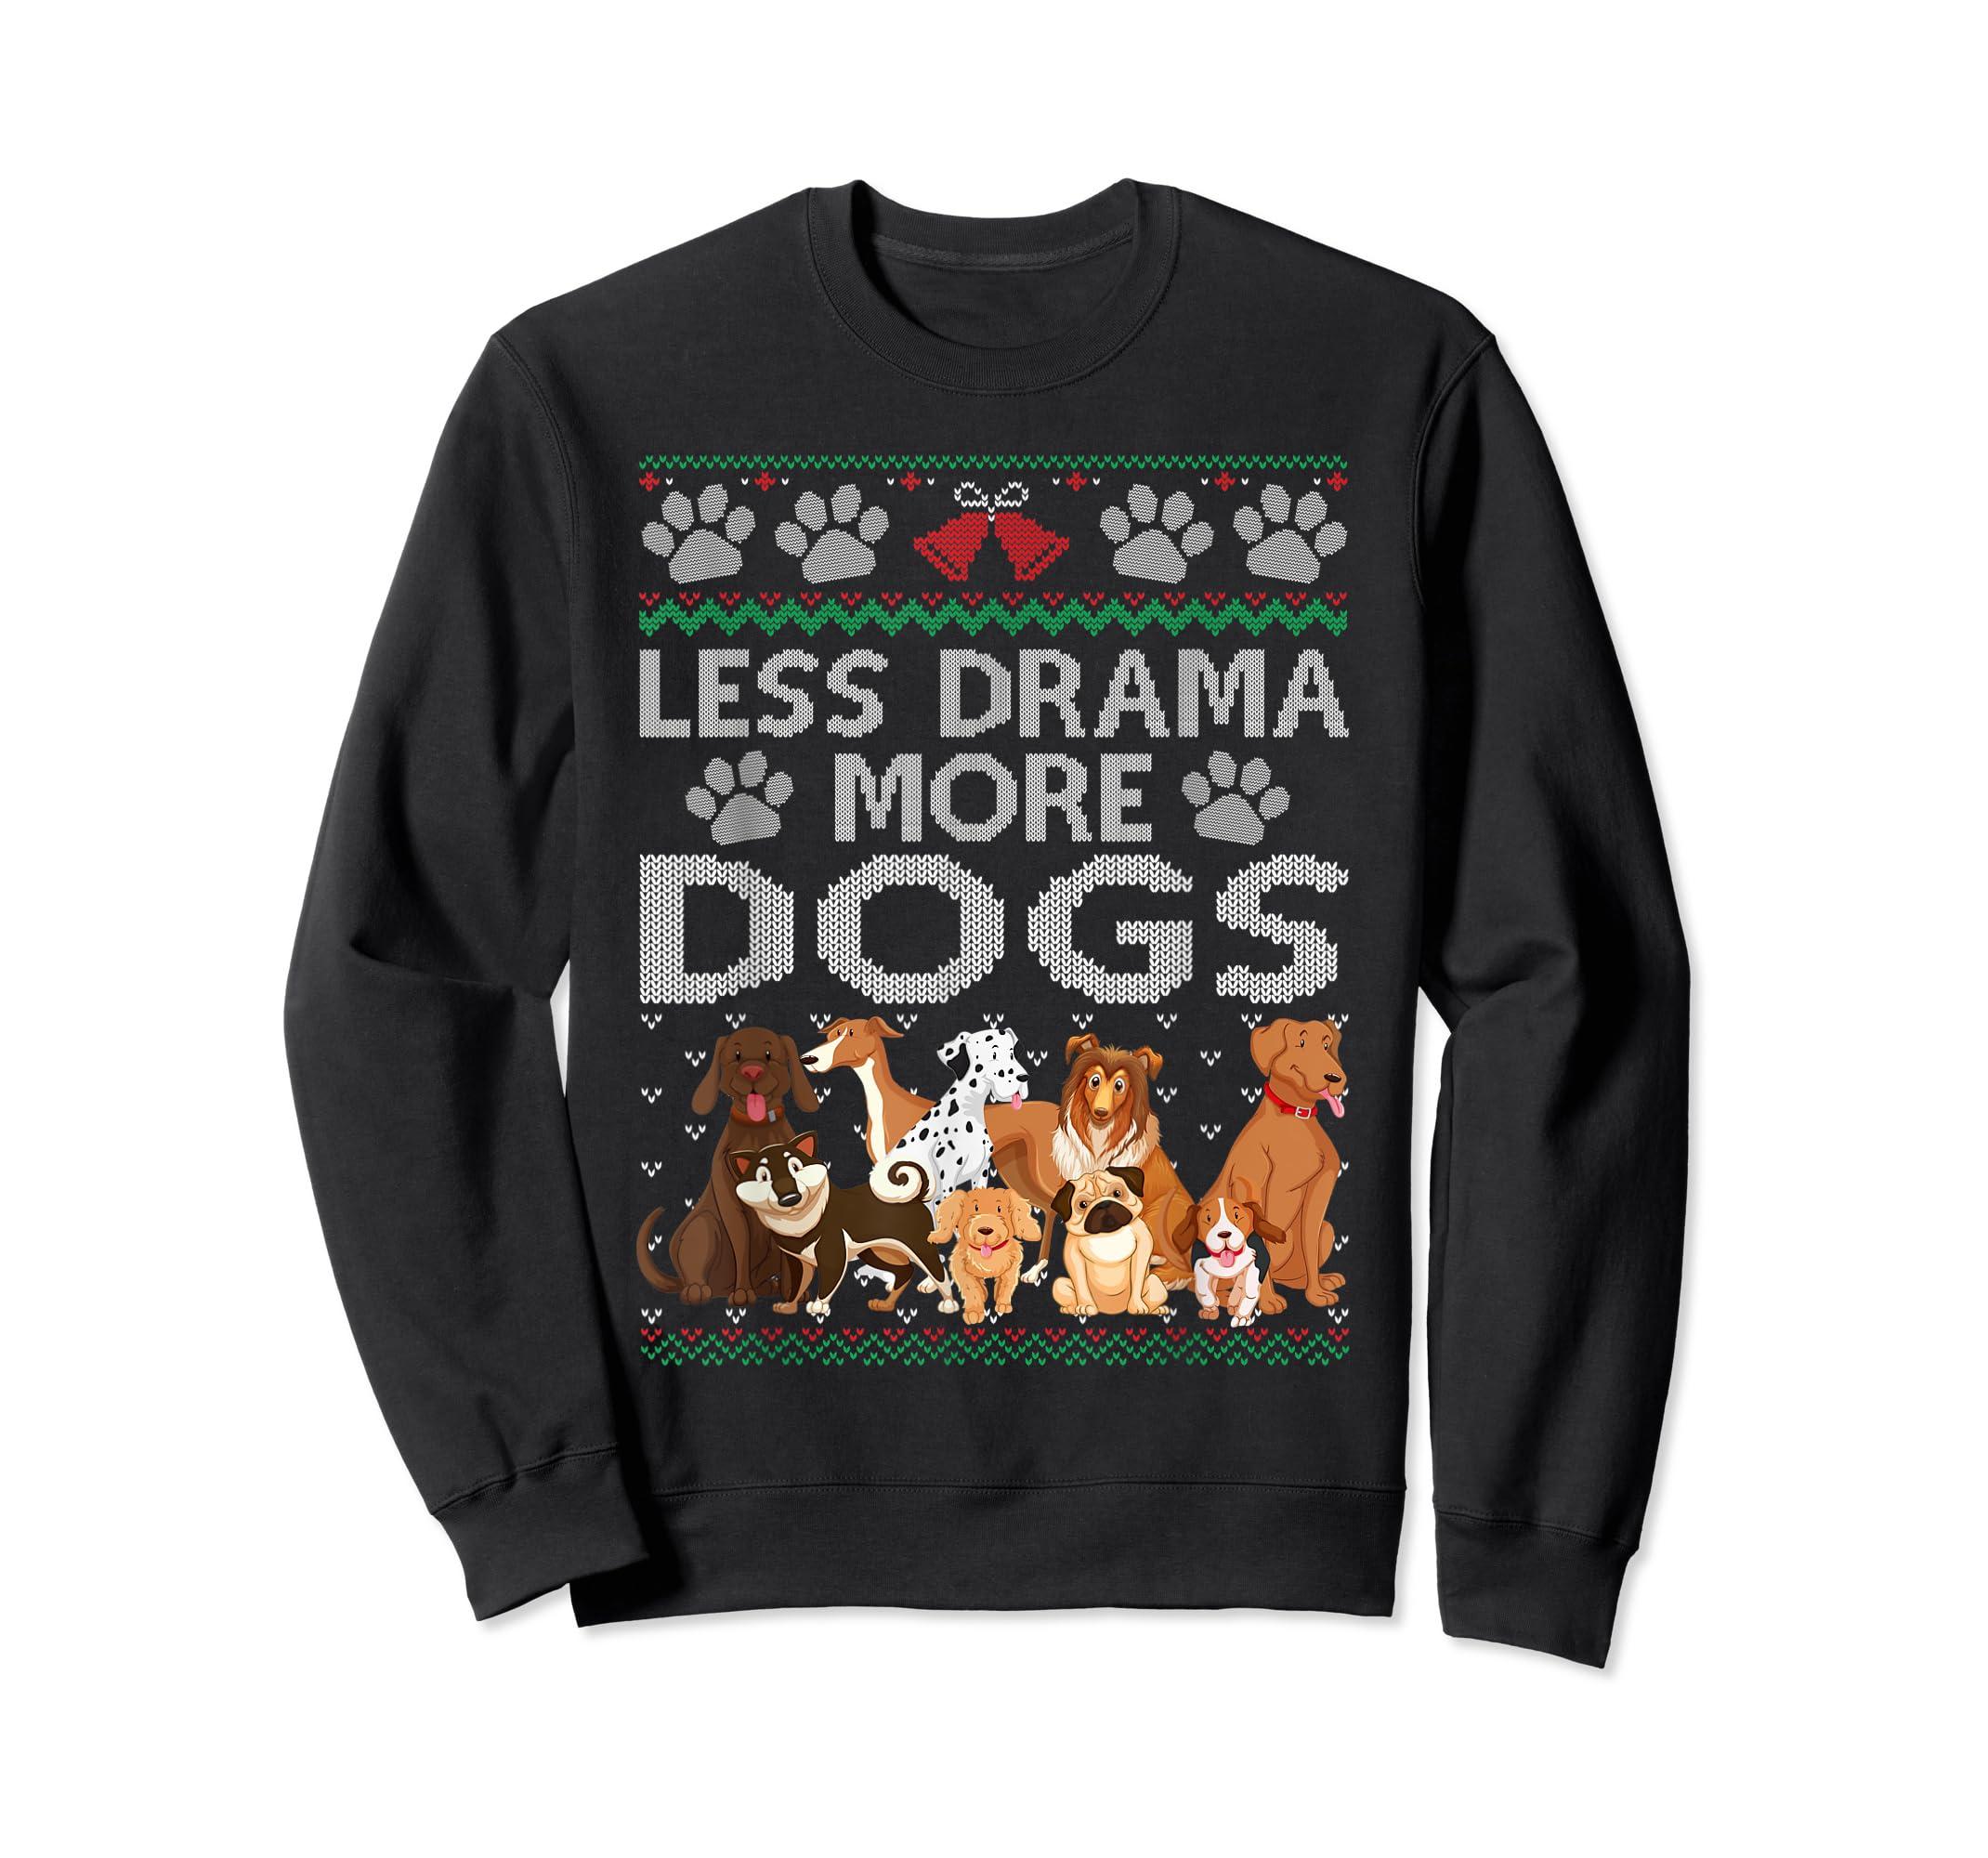 Less Drama More Dogs Cute Christmas Ugly Xmas Sweater Gift T-Shirt-Sweatshirt-Black